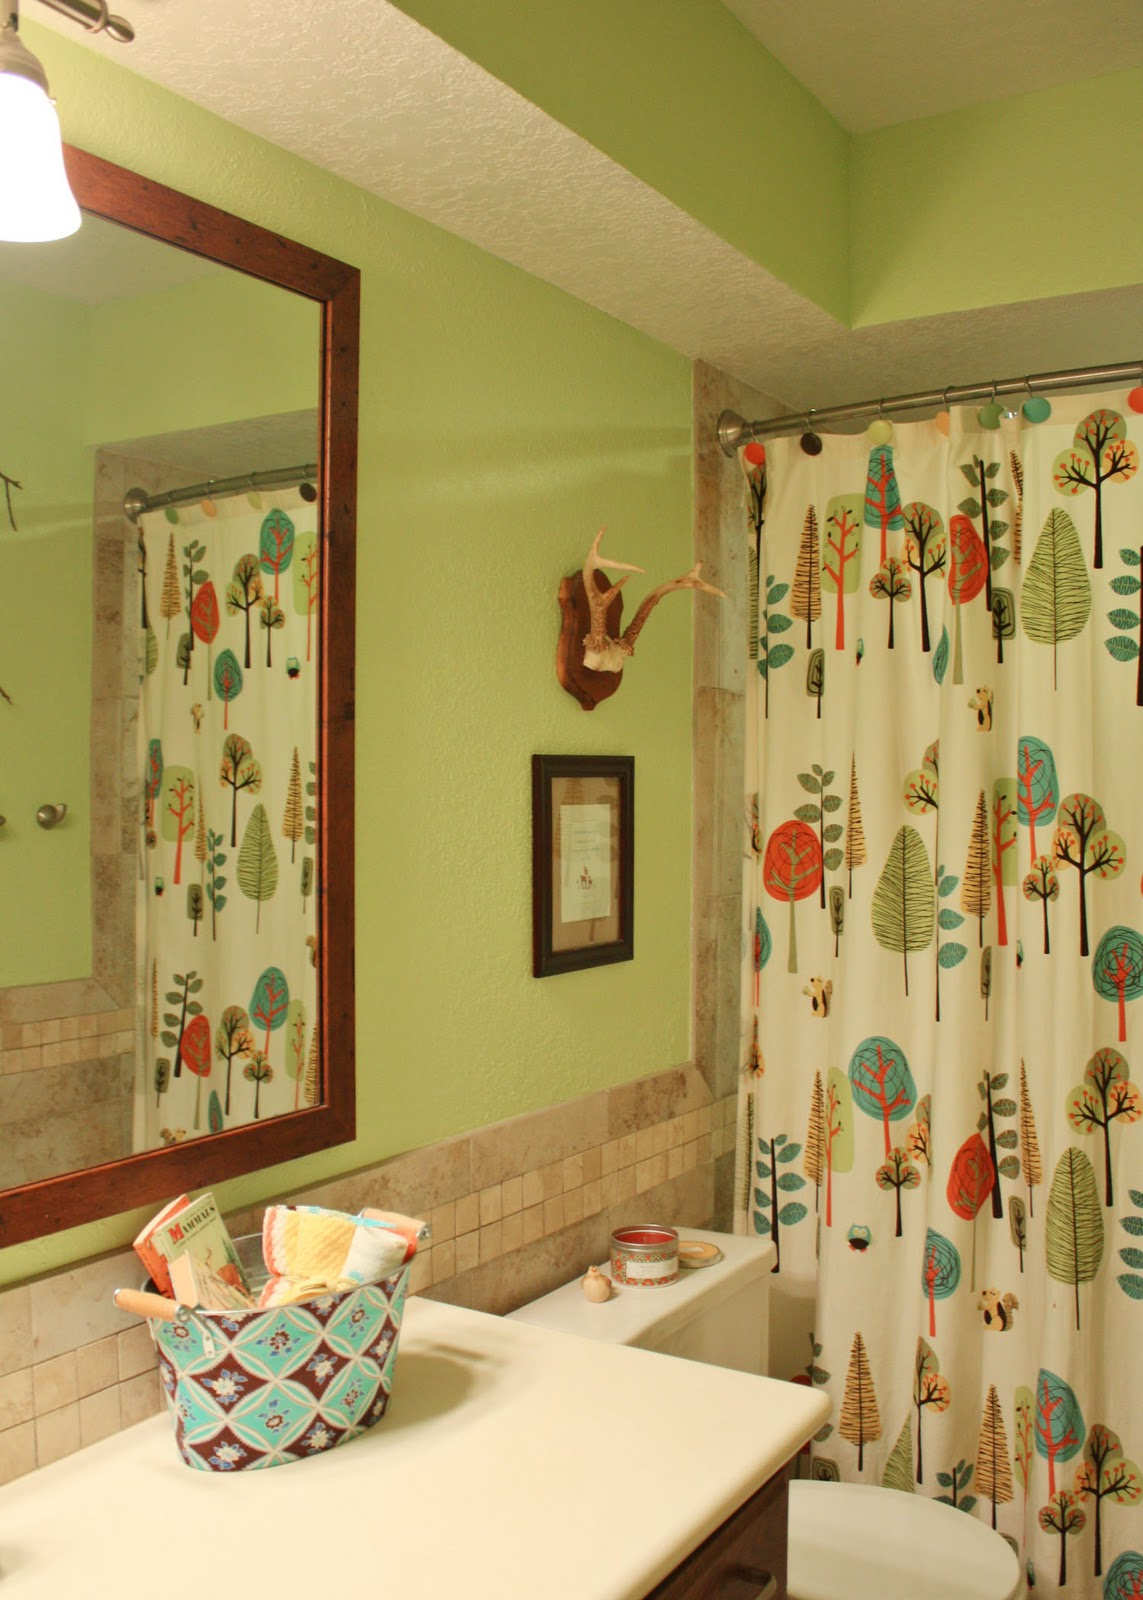 amy j delightful blog HOME SWEET HOME TOUR Guestkids Bathroom